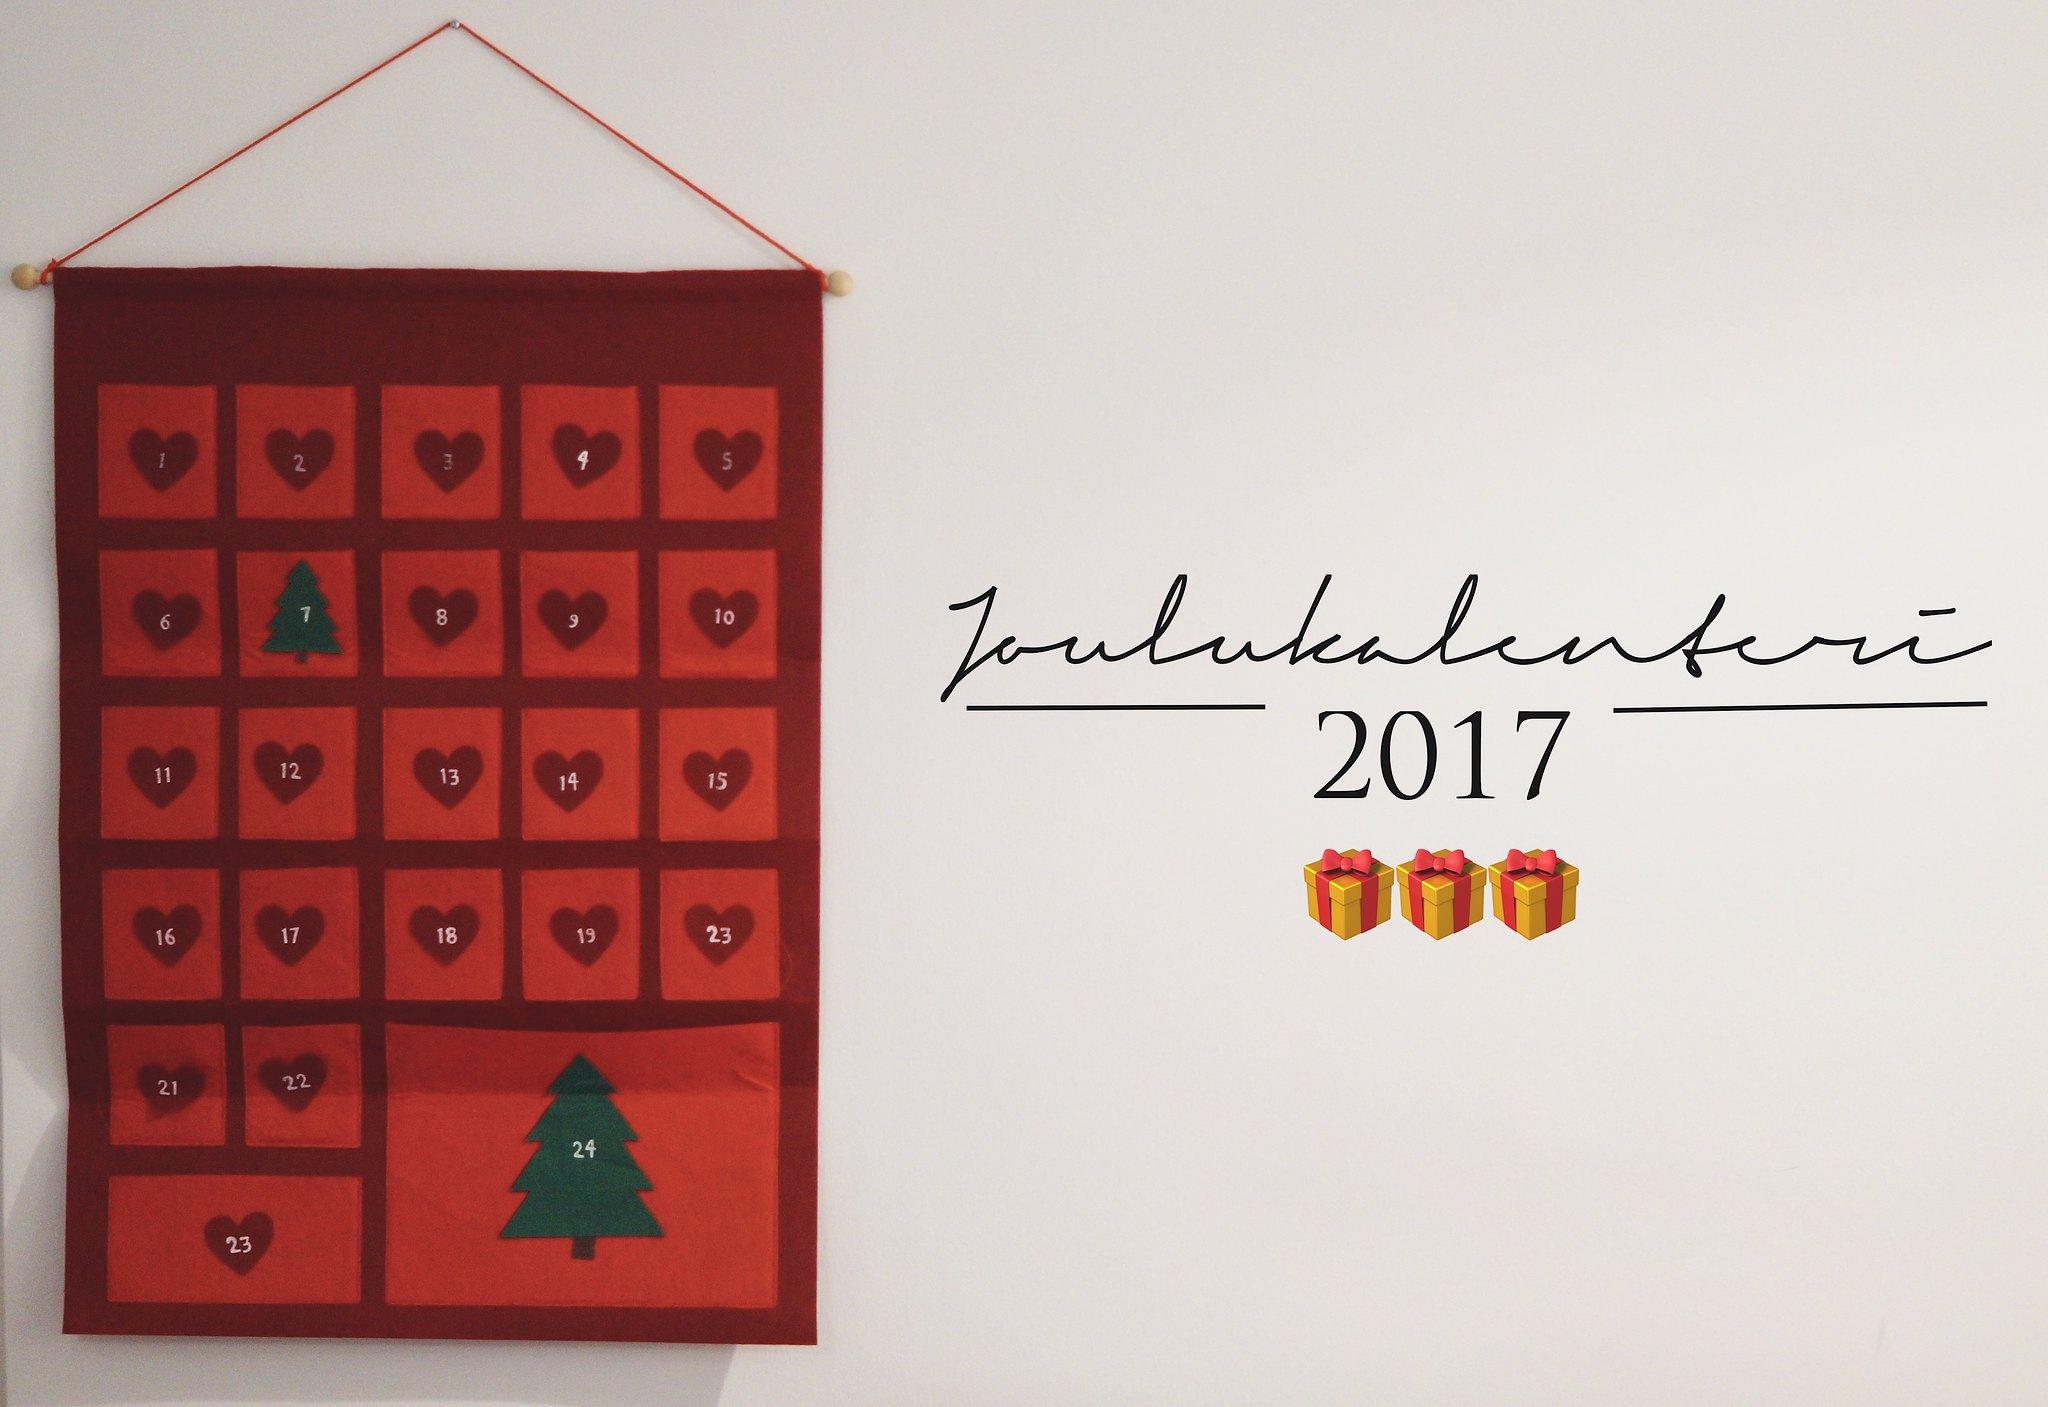 blogi joulukalenteri 2017